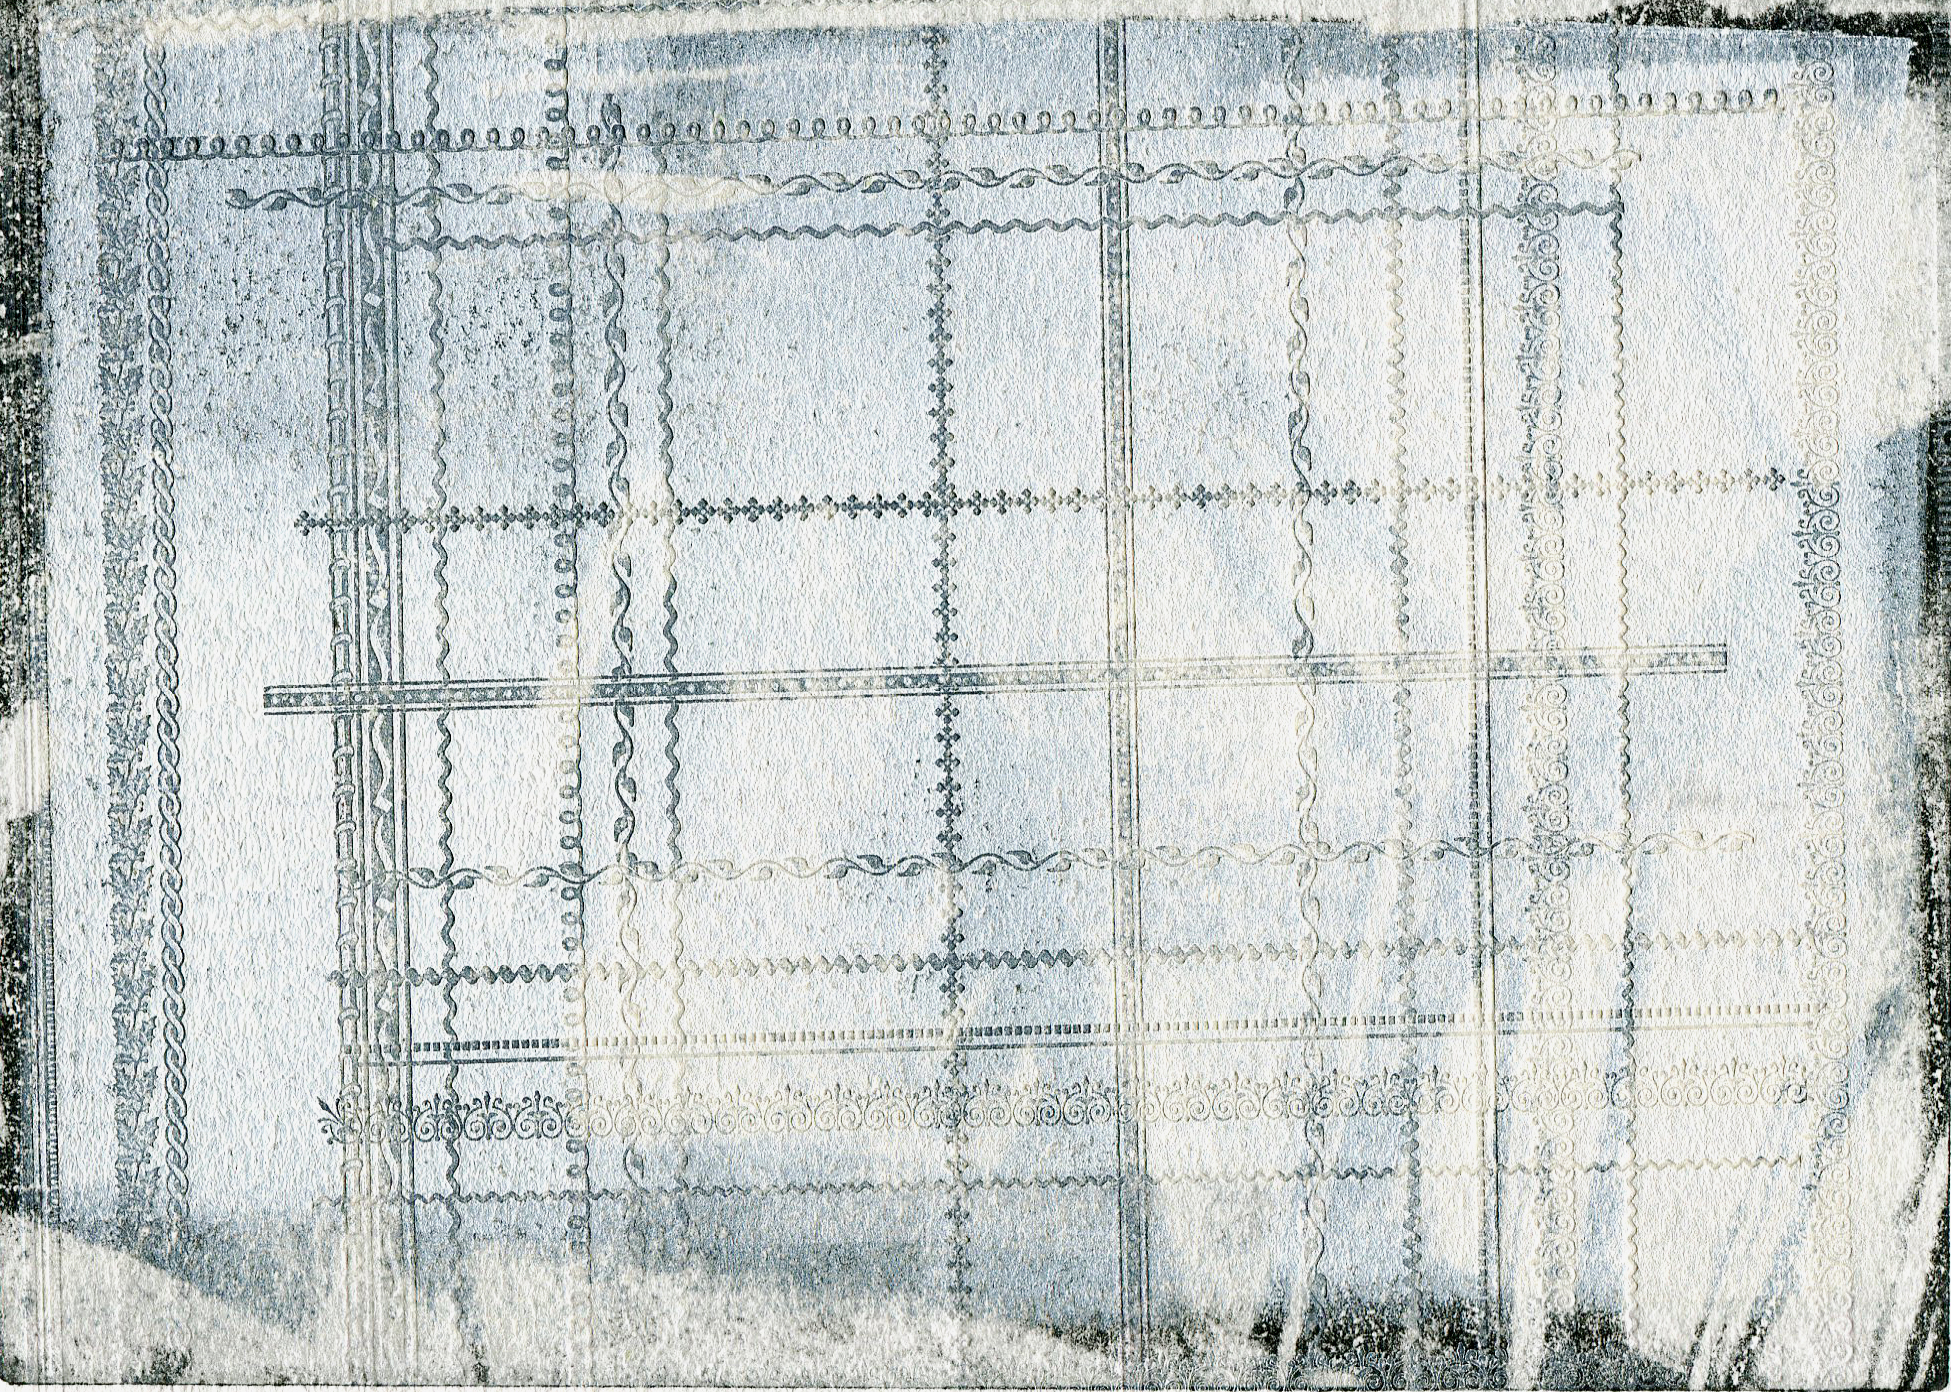 Tapestry 1.jpg